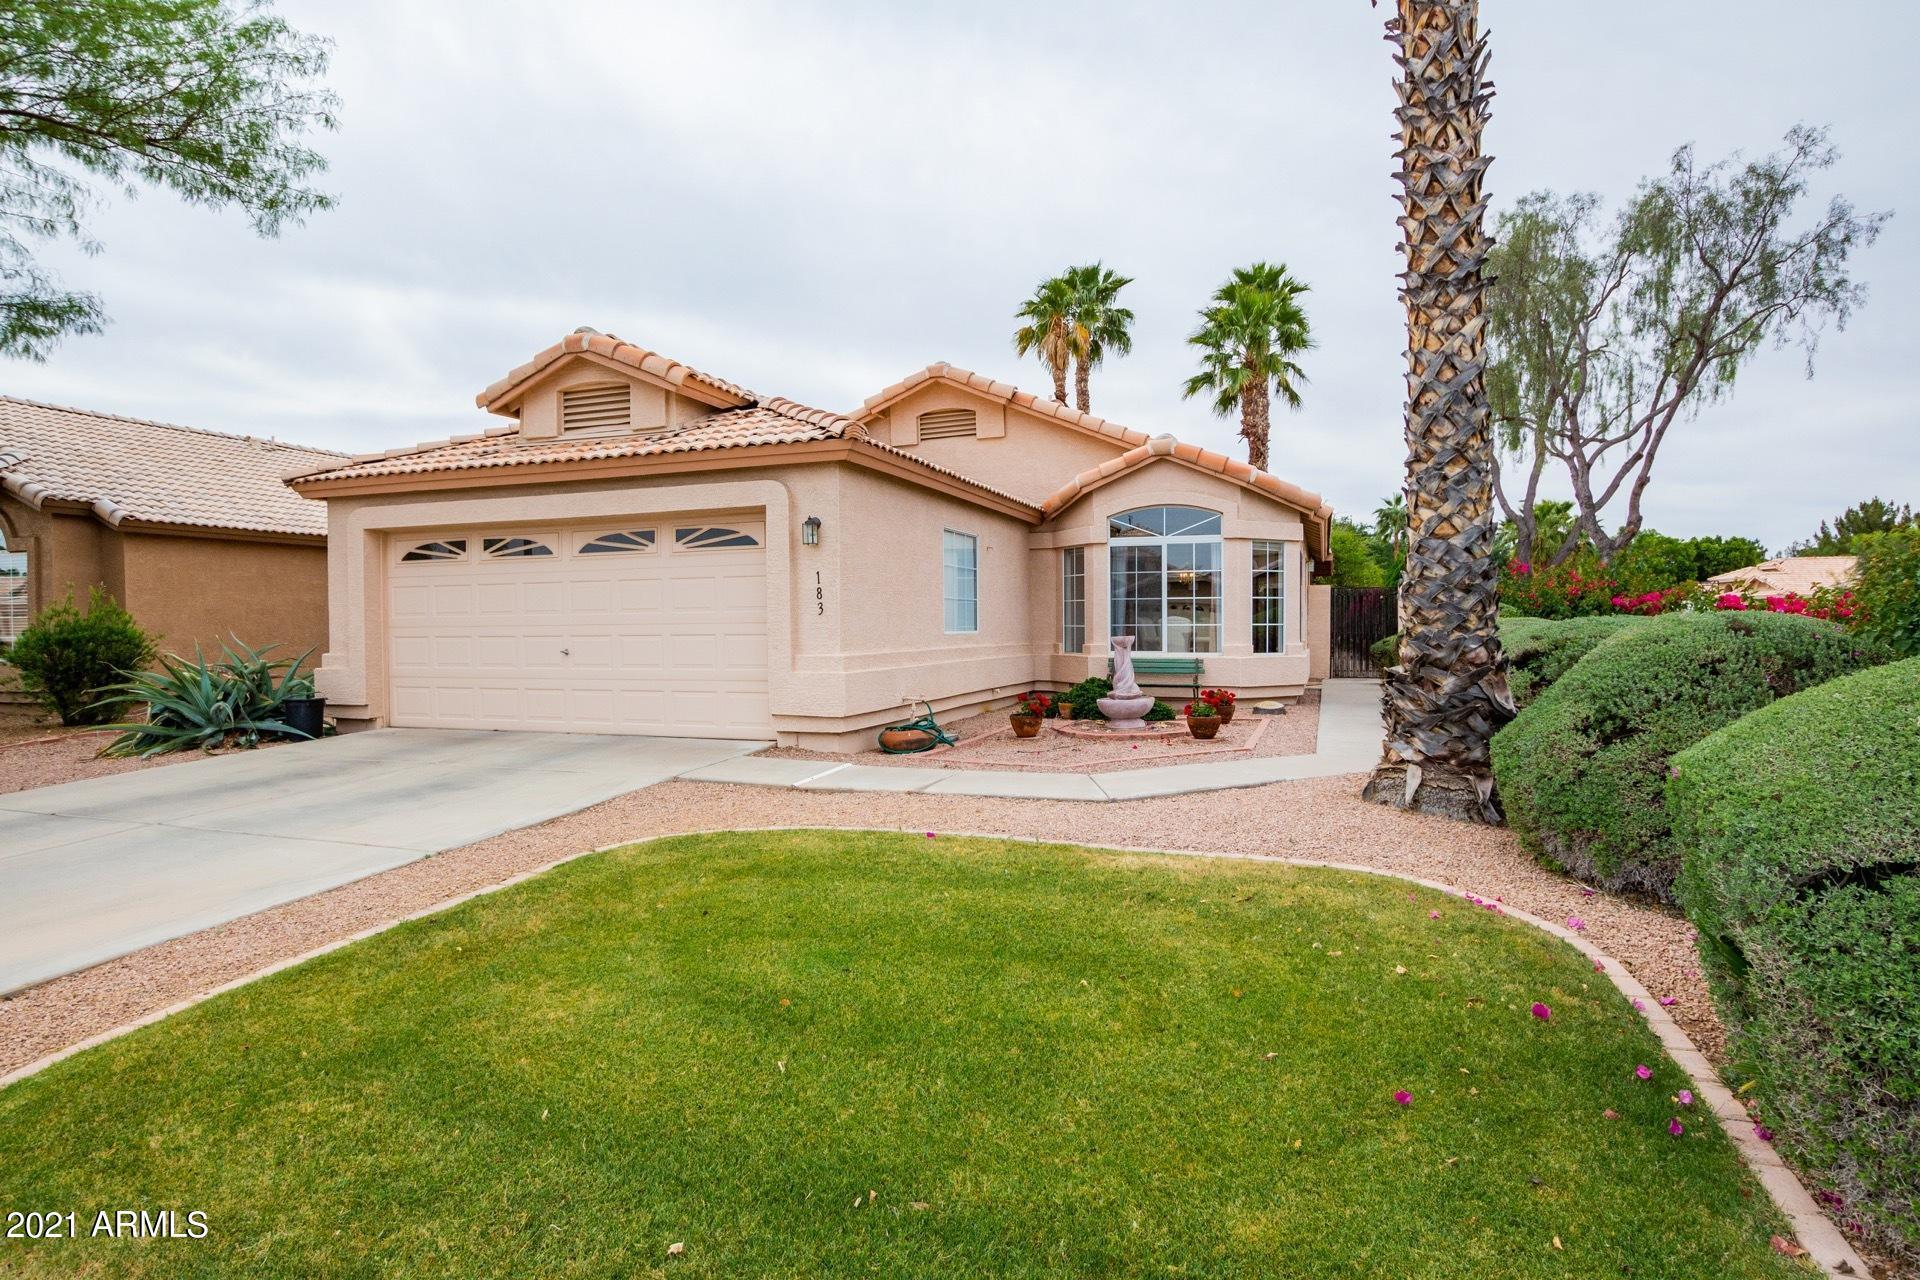 183 GAIL Drive, Gilbert, Arizona 85233, 3 Bedrooms Bedrooms, ,2 BathroomsBathrooms,Residential,For Sale,GAIL,6229193